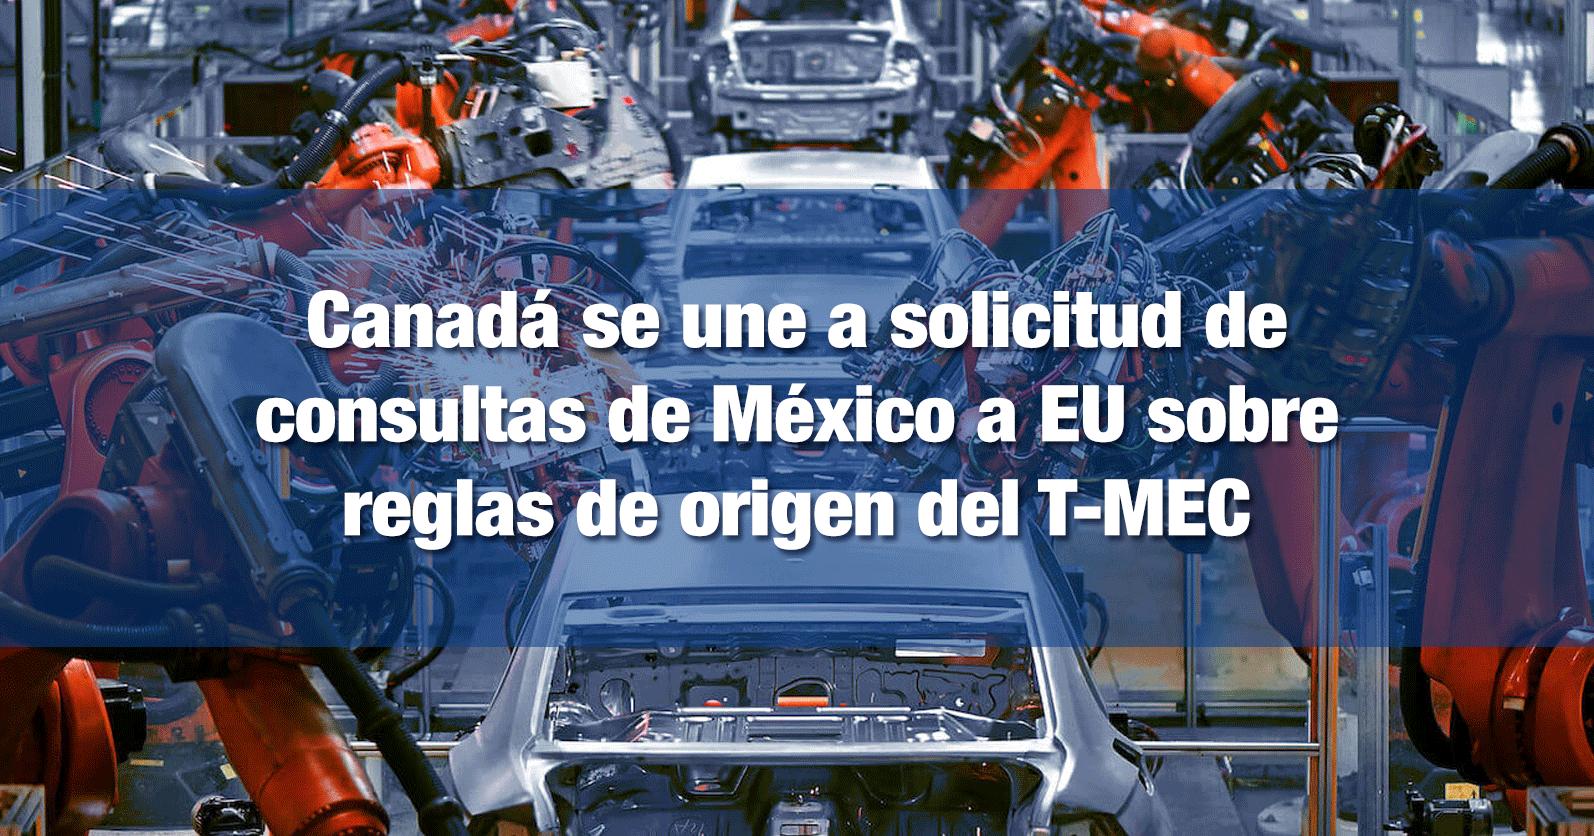 Canadá se une a solicitud de consultas de México a EU sobre reglas de origen del T-MEC